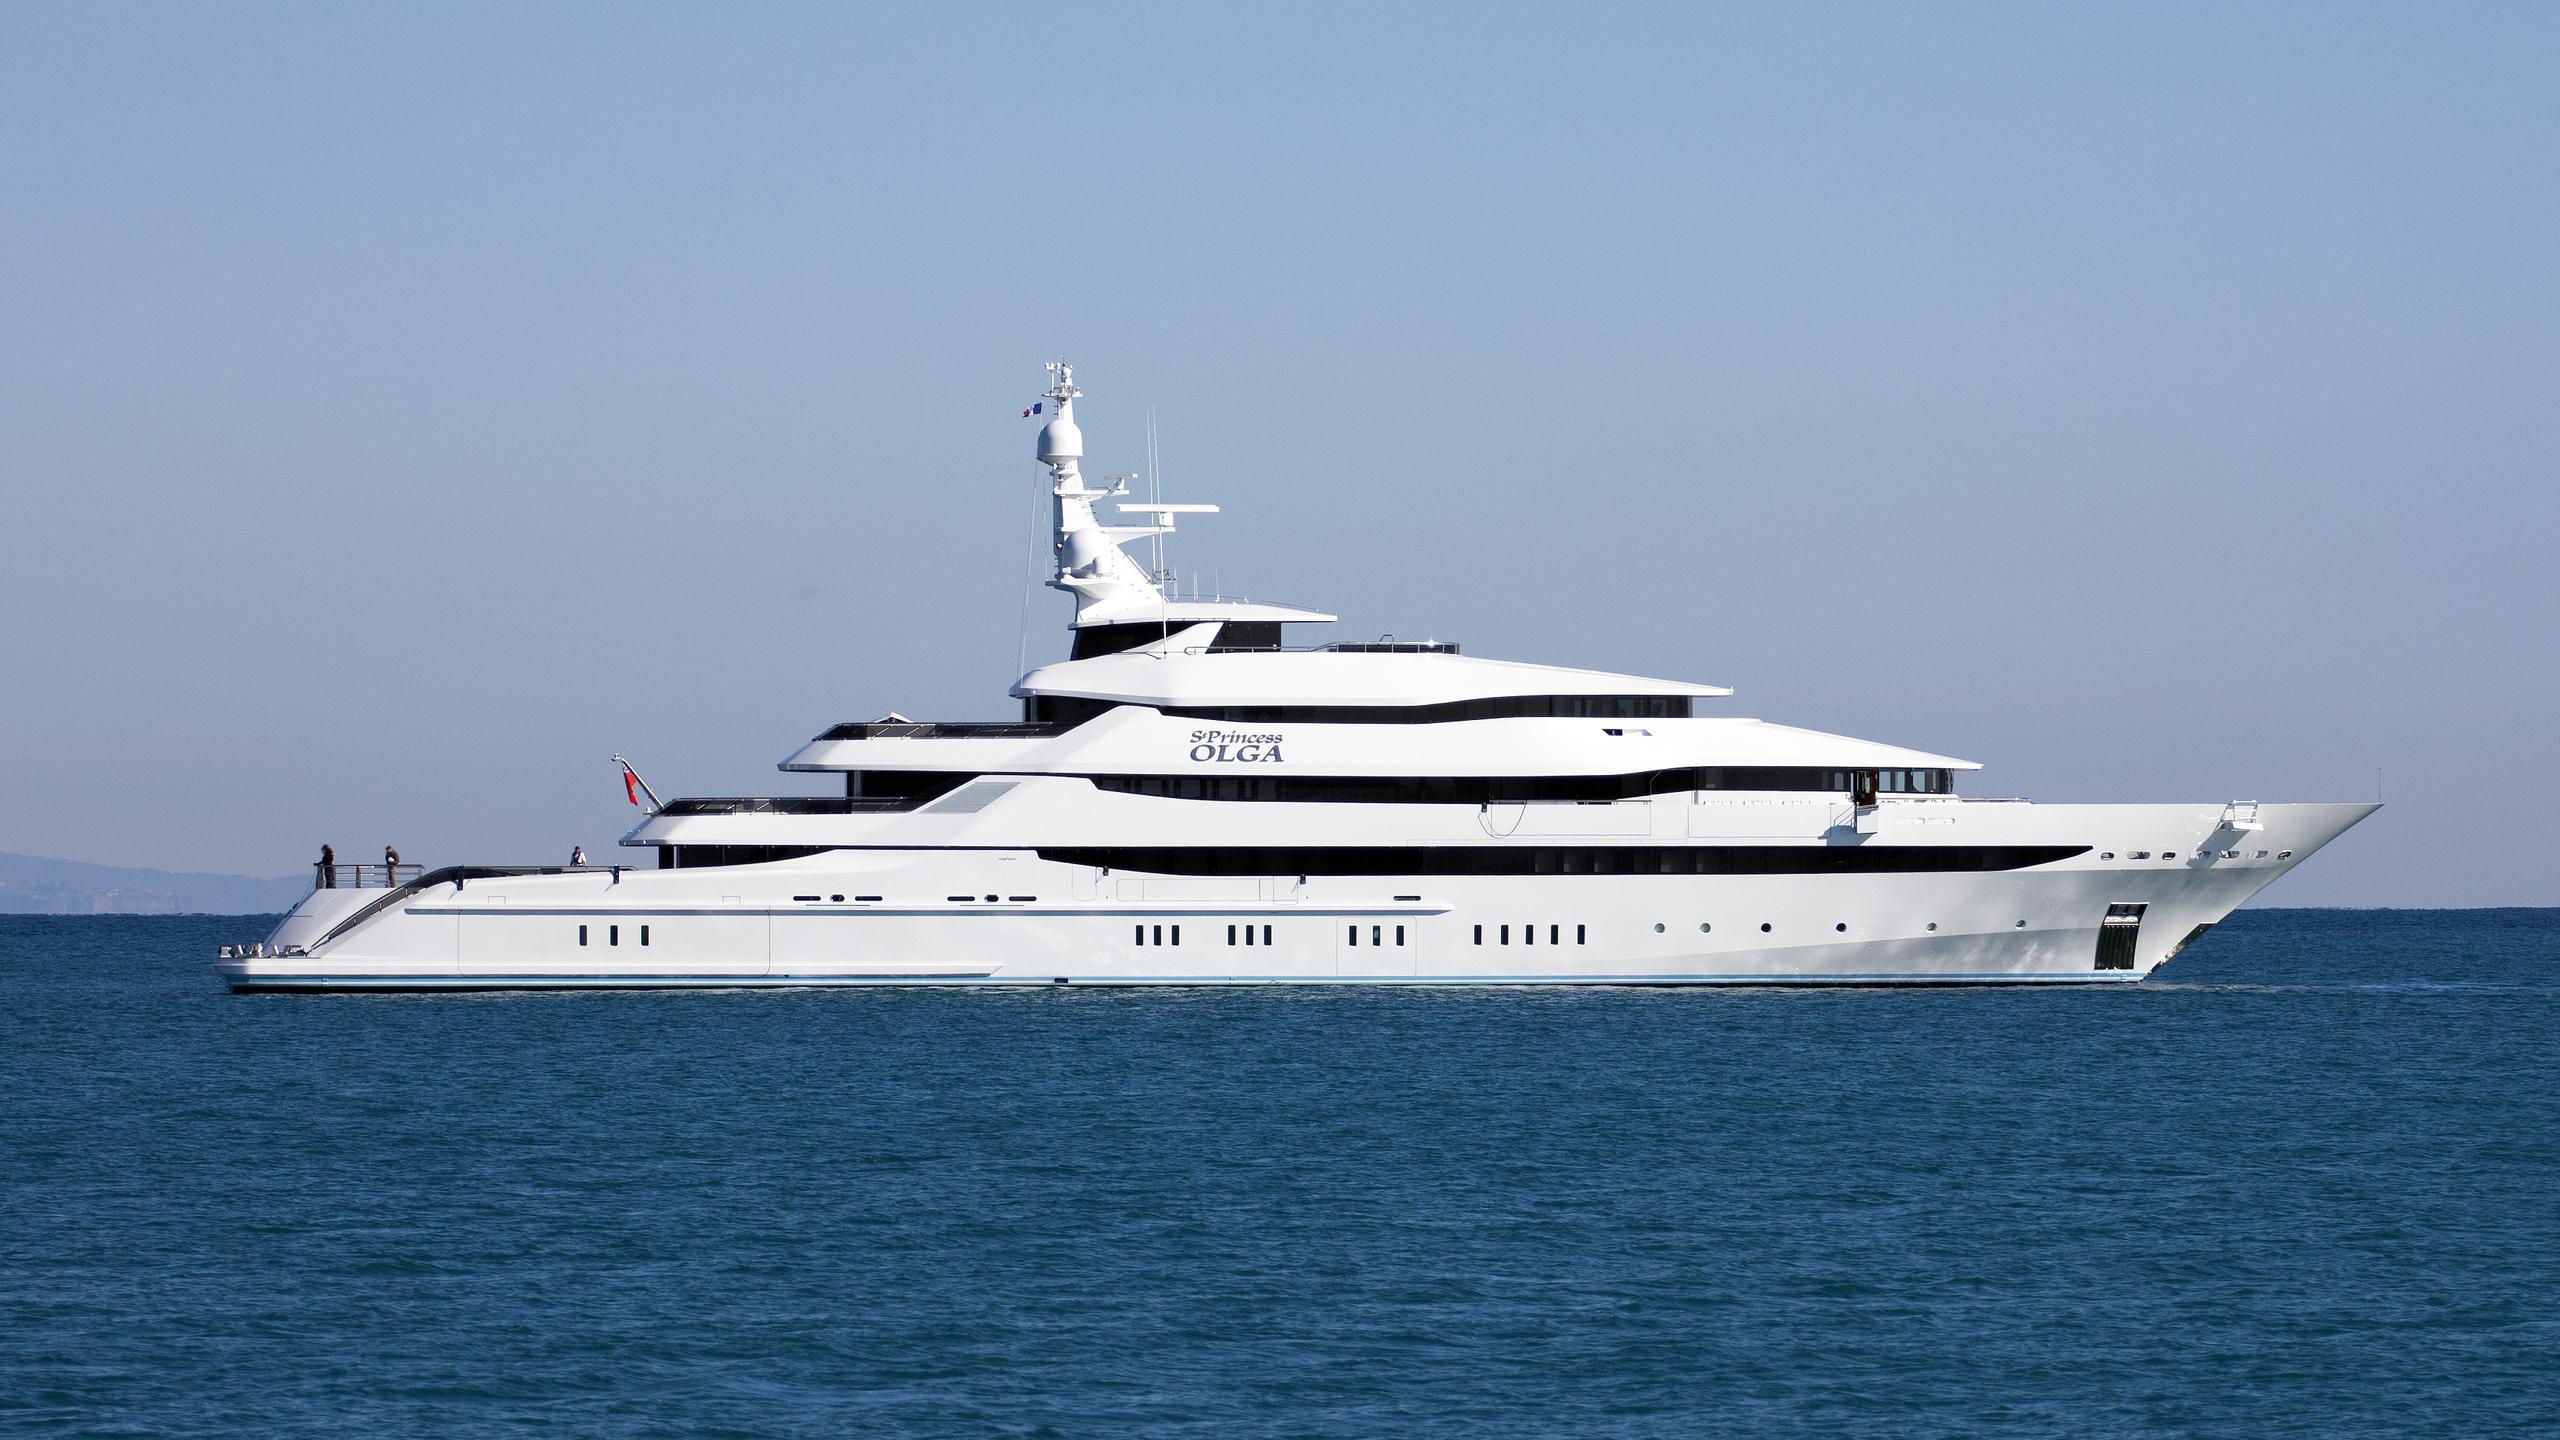 amore-vero-st-princess-olga-motor-yacht-oceanco-2013-86m-profile